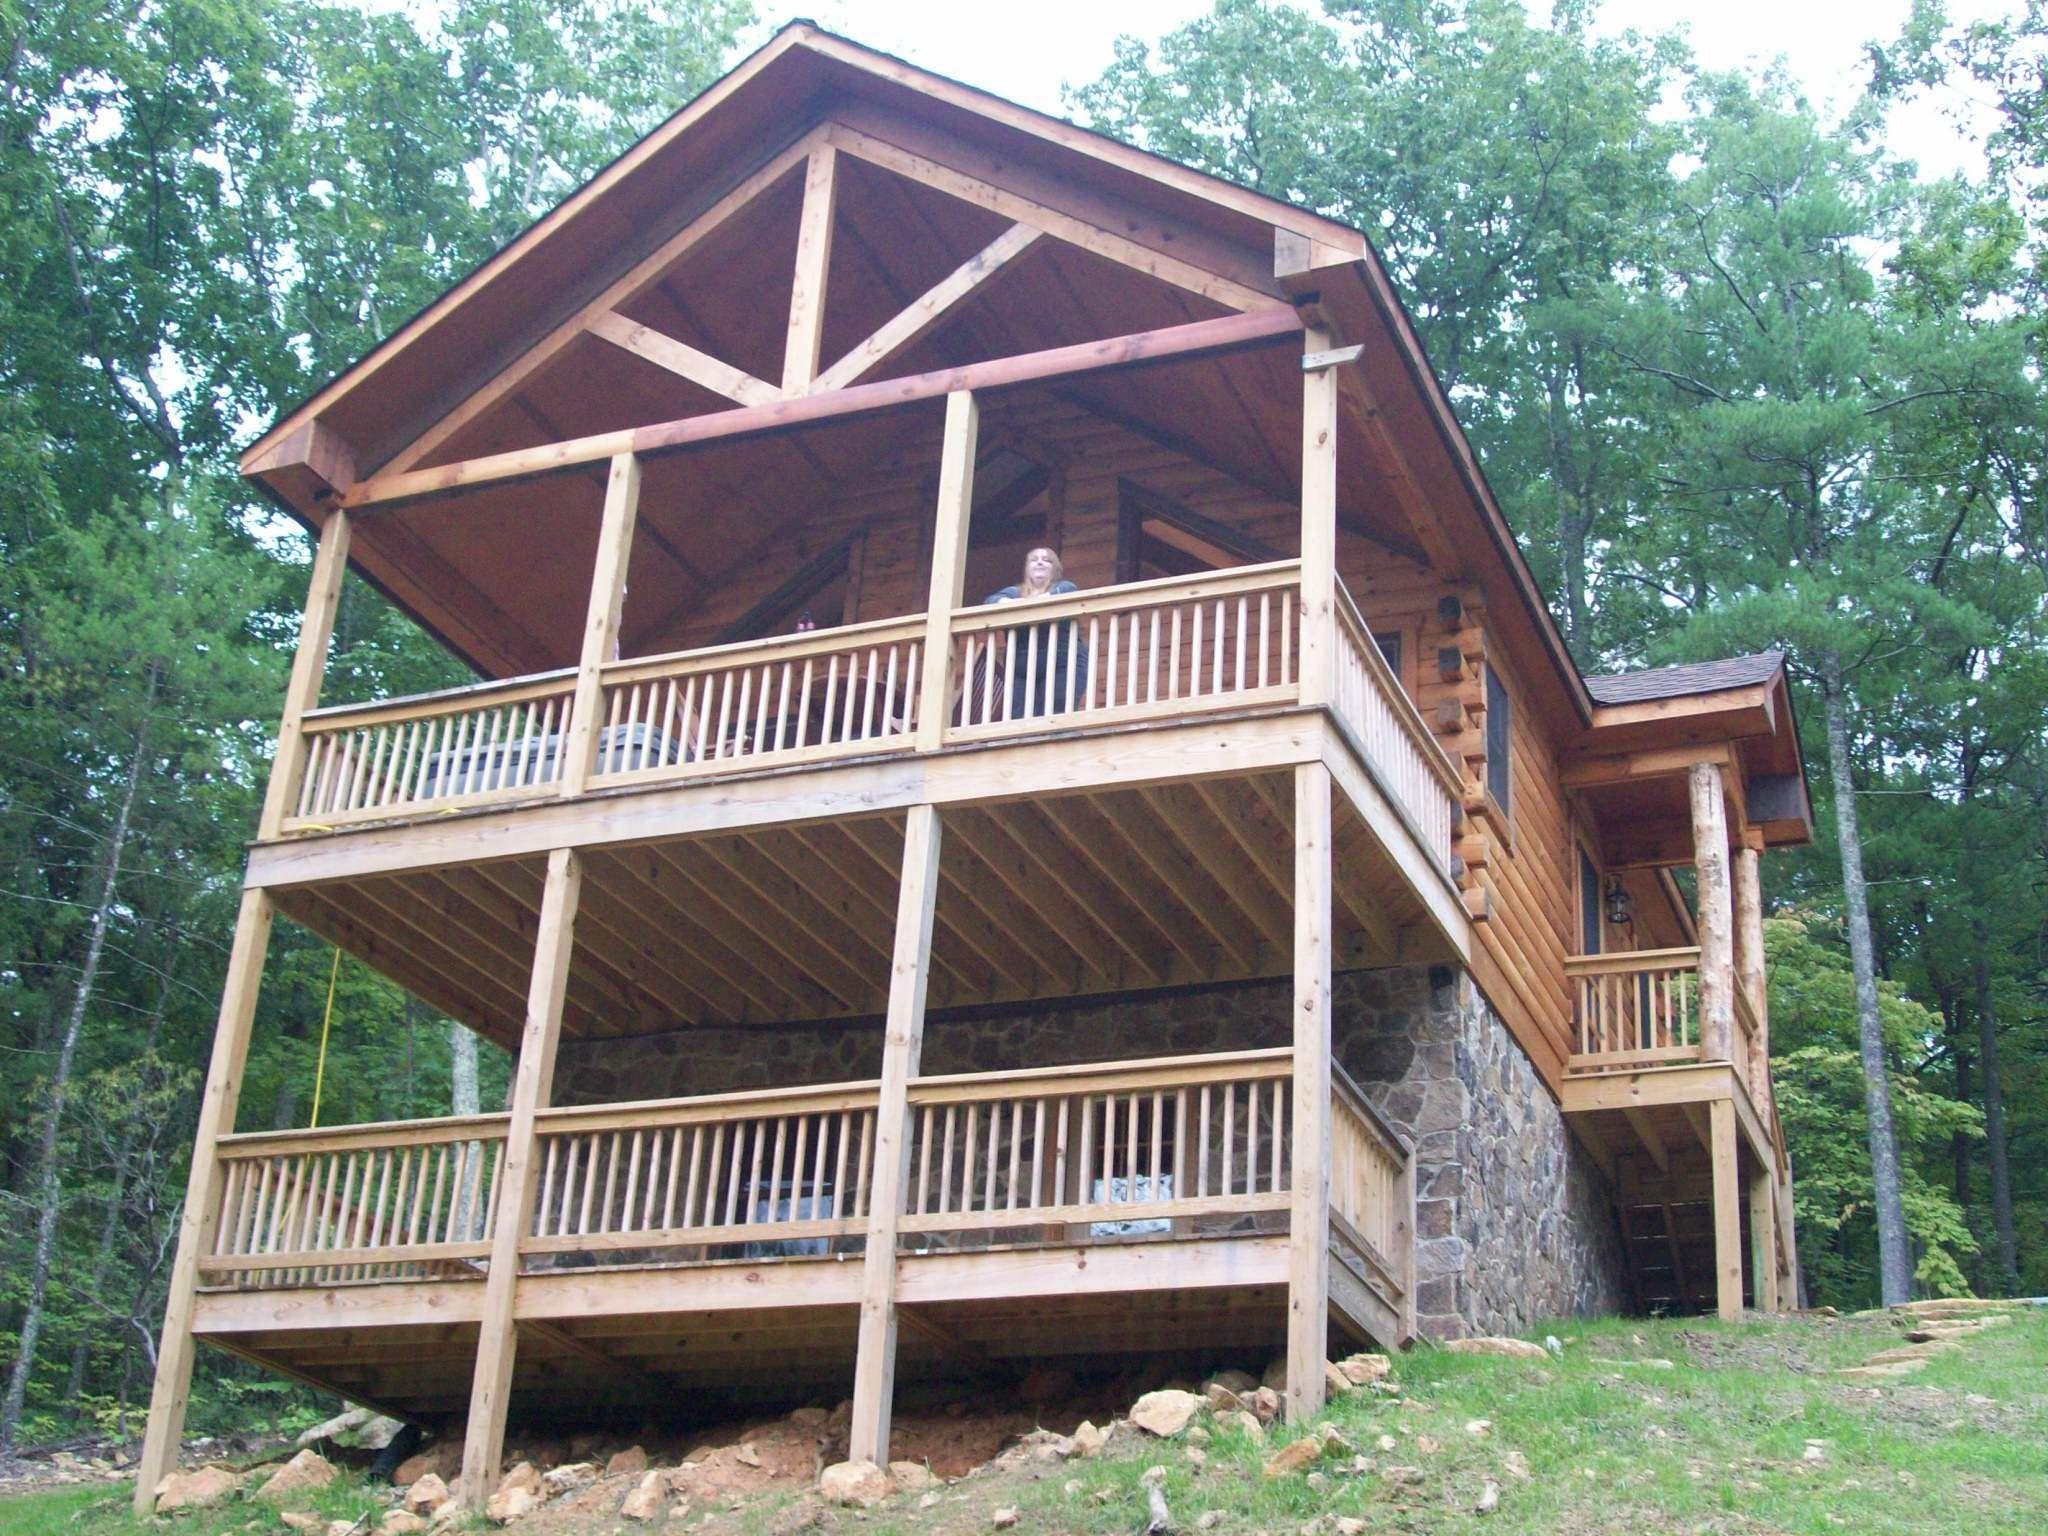 virginia rental cabin faqs top rentals ga north mountain georgia mountains headreservations luxury cabins tub in hot